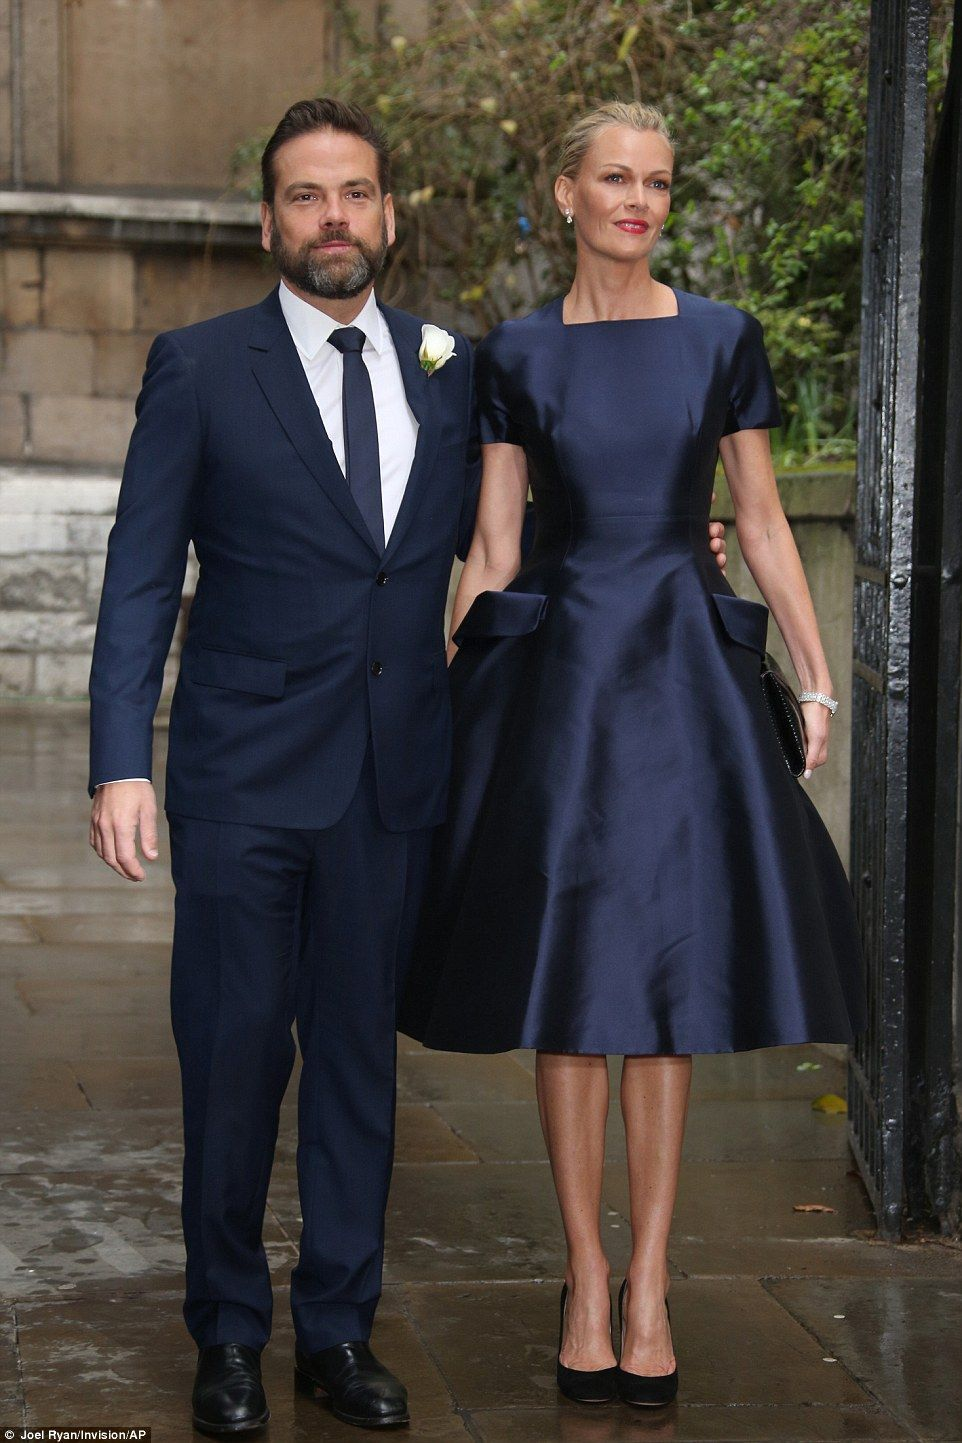 Abiti Da Cerimonia Joel.Rupert Murdoch And Jerry Hall To Hold Ceremony At Fleet Street